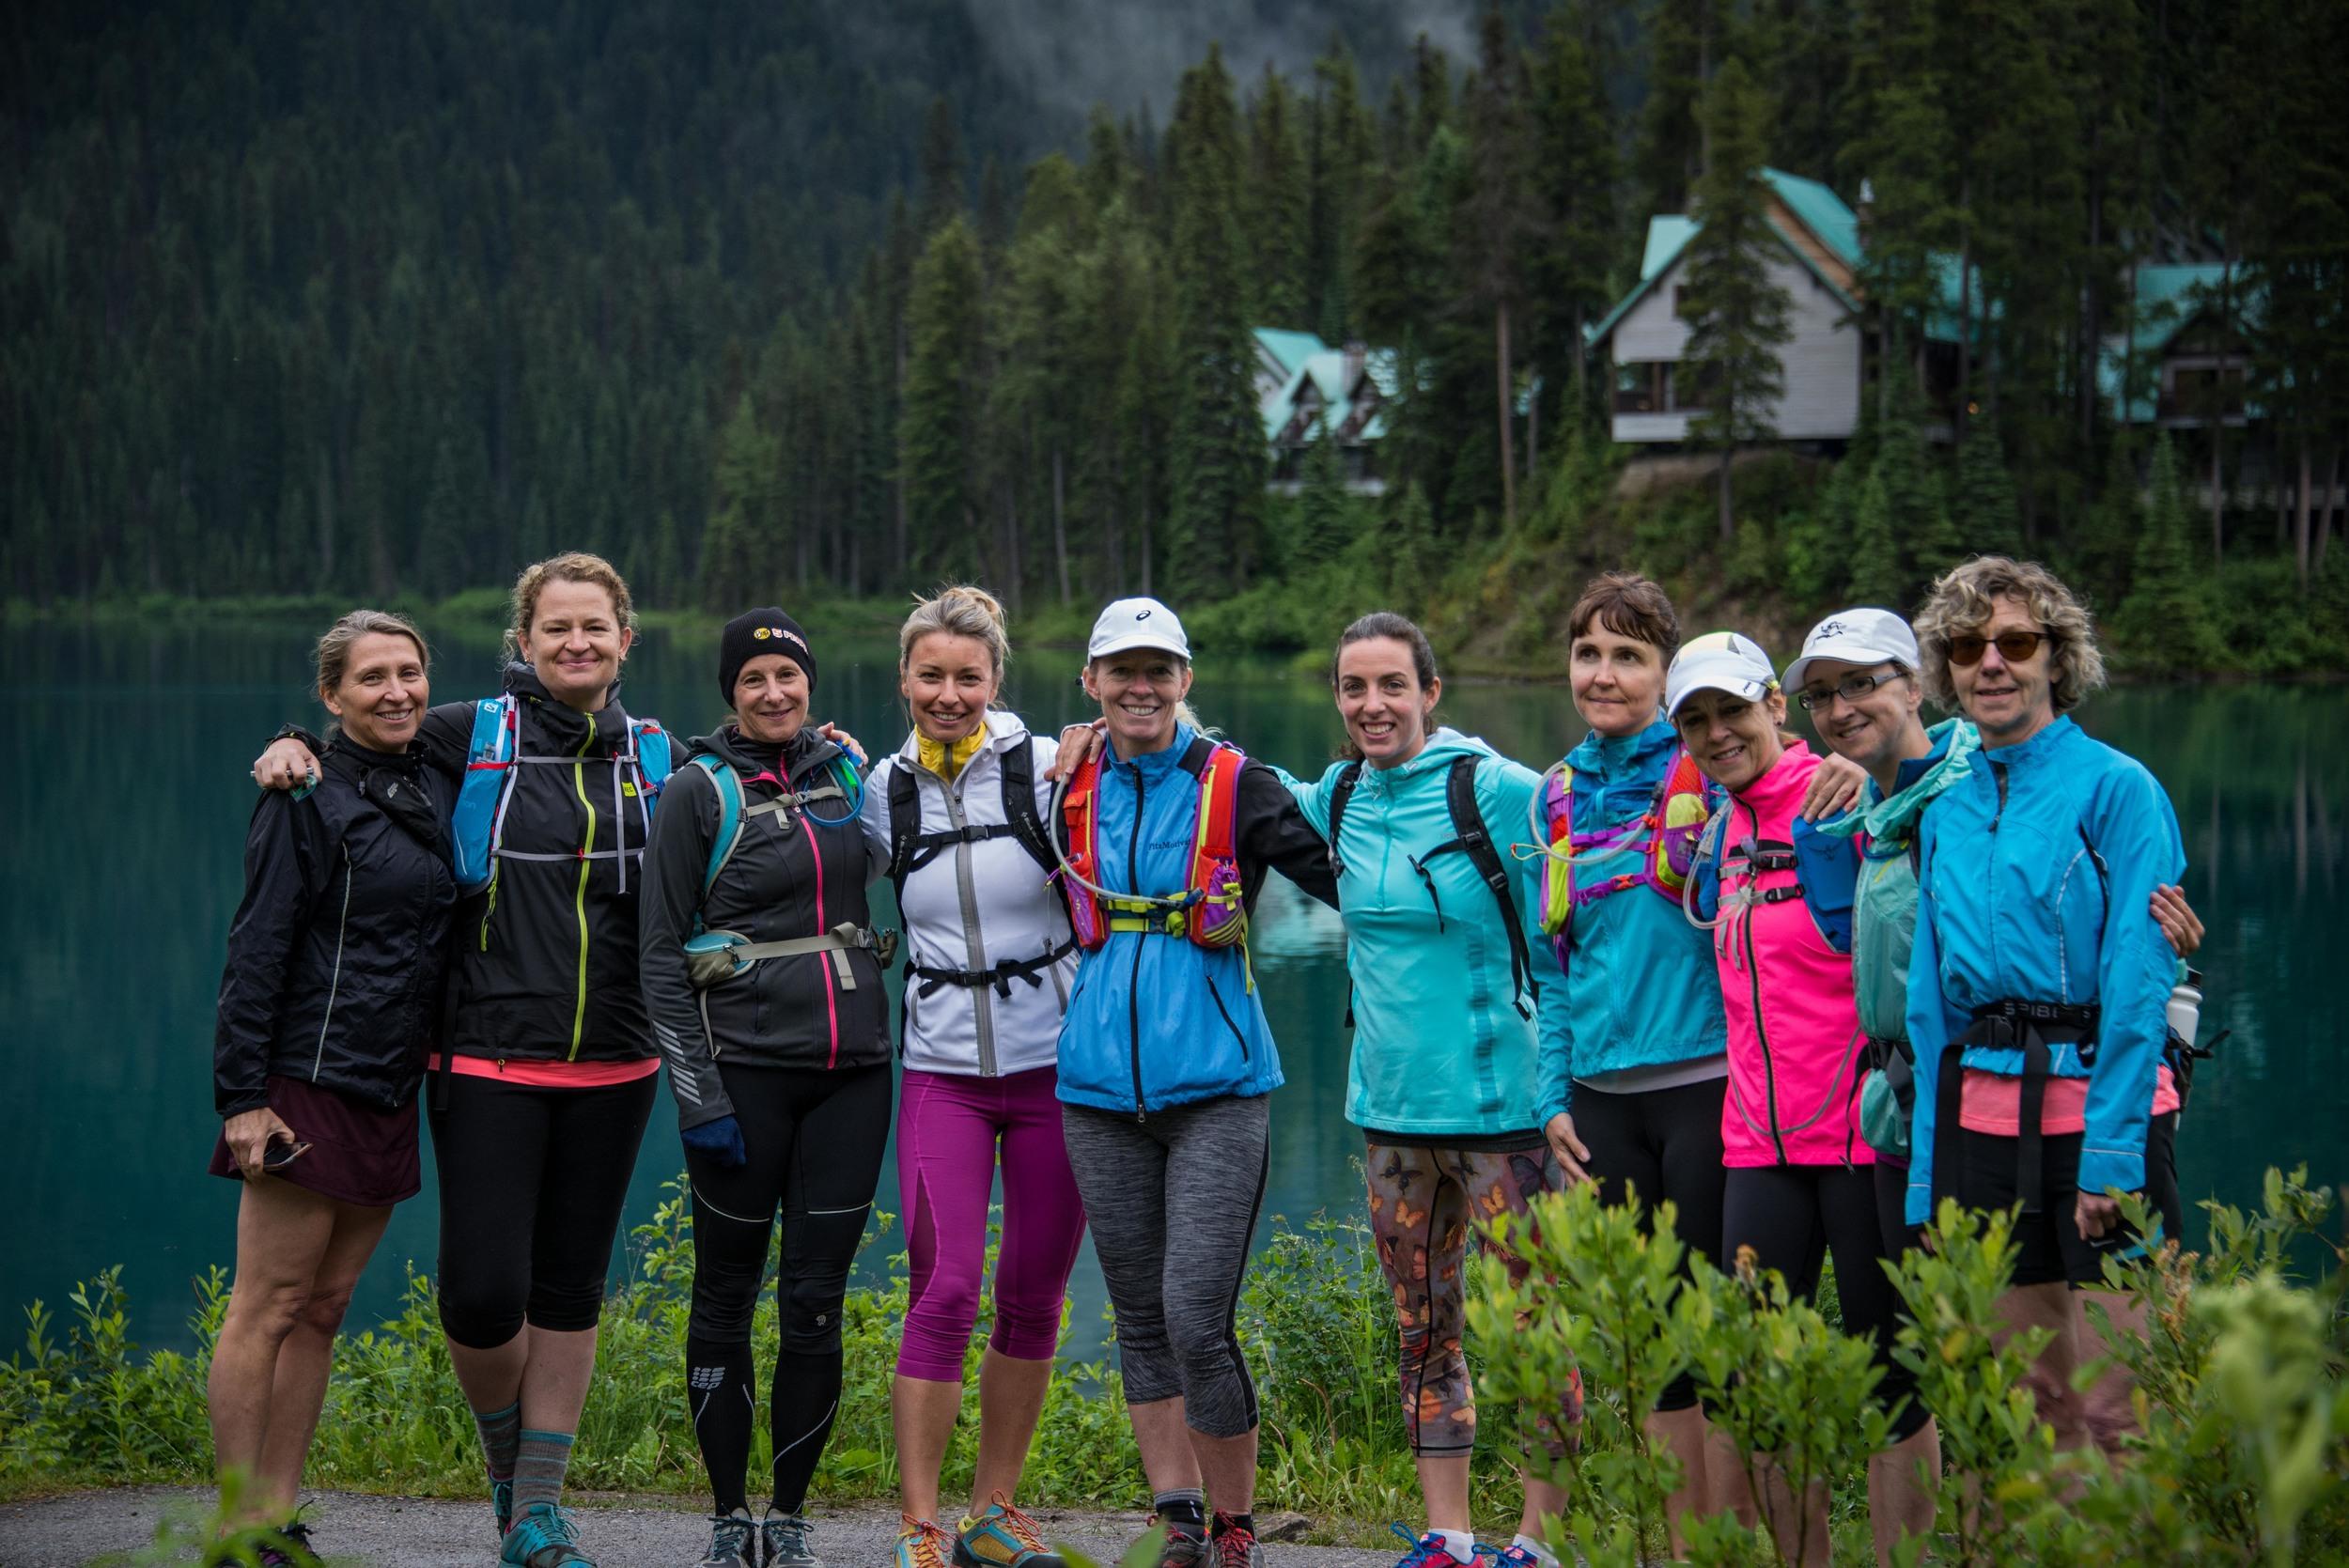 running-yoga-retreat-lush-acomadation-golden-emerald-lake-lodge-67.jpg